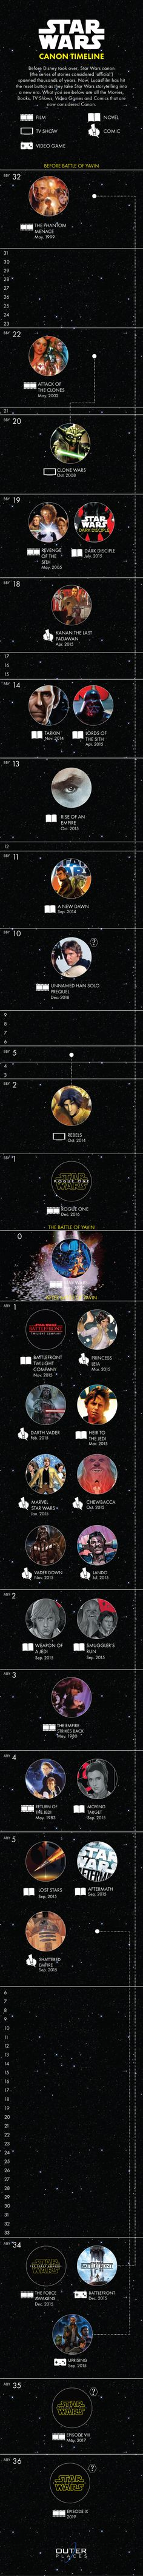 infographic-star-wars-w715